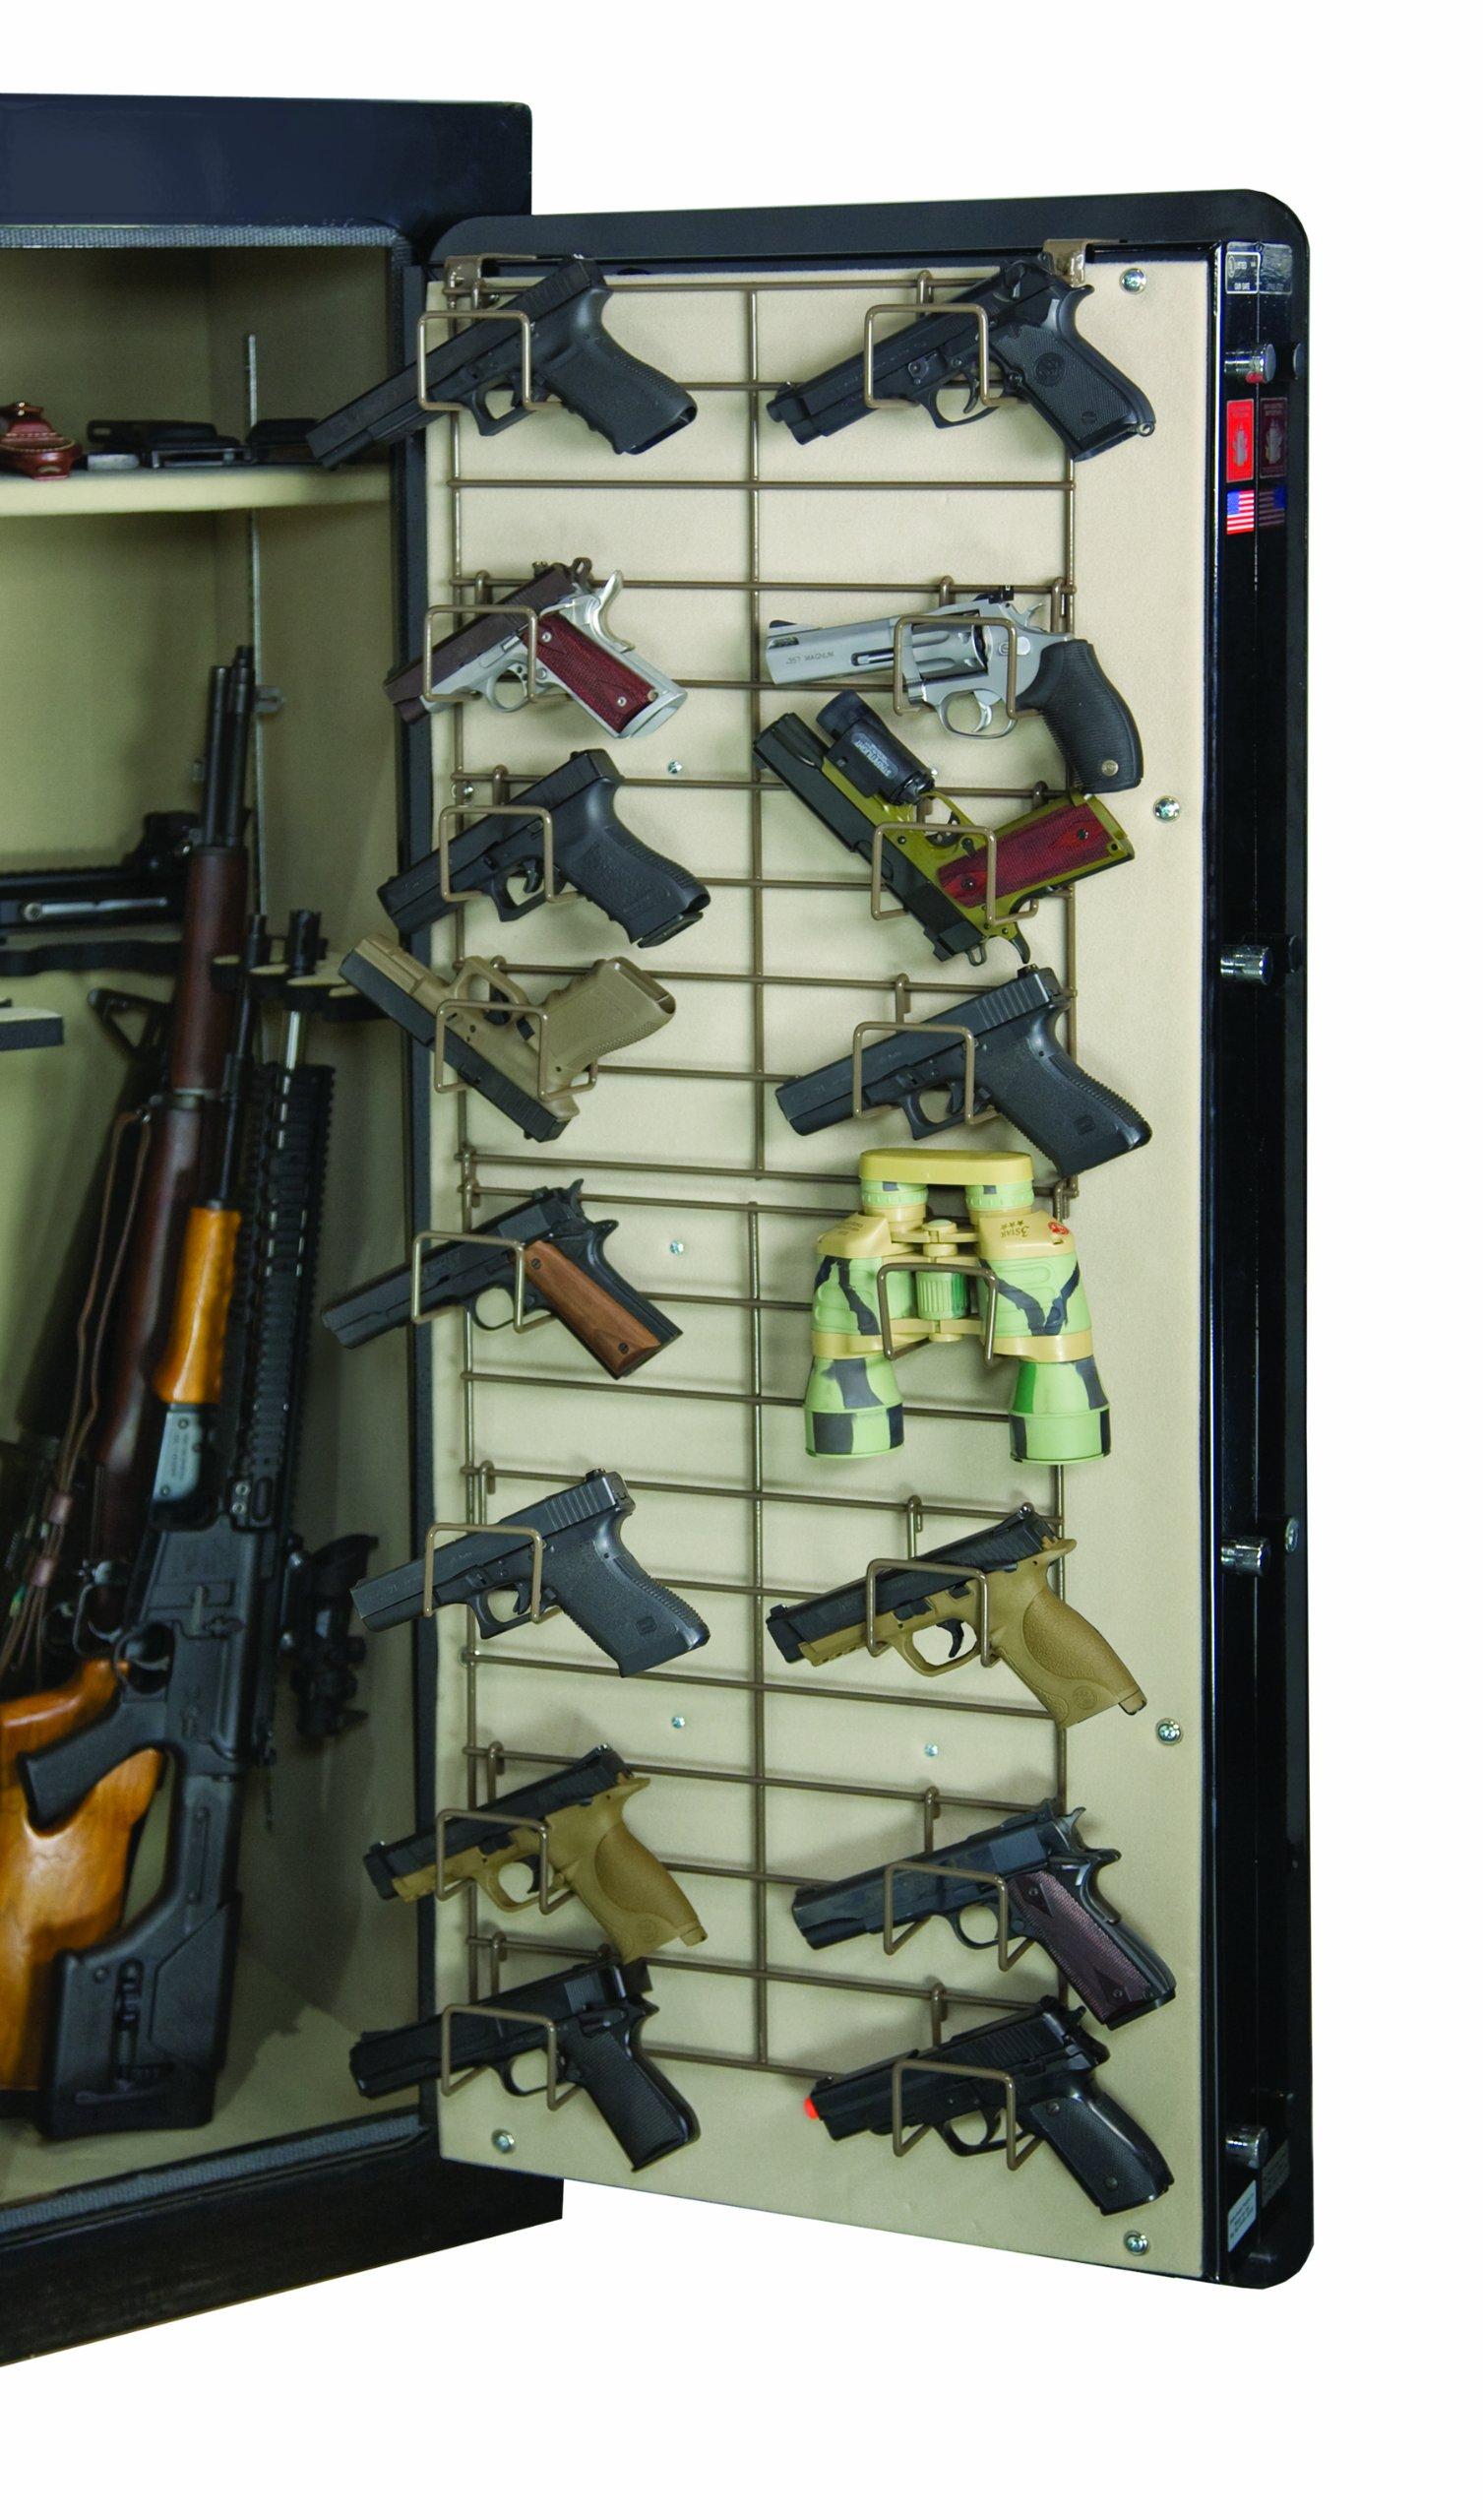 Rack'Em The Maximizer 16 Pistol In-Safe Handgun Rack (Full Door) by Rack'em (Image #2)